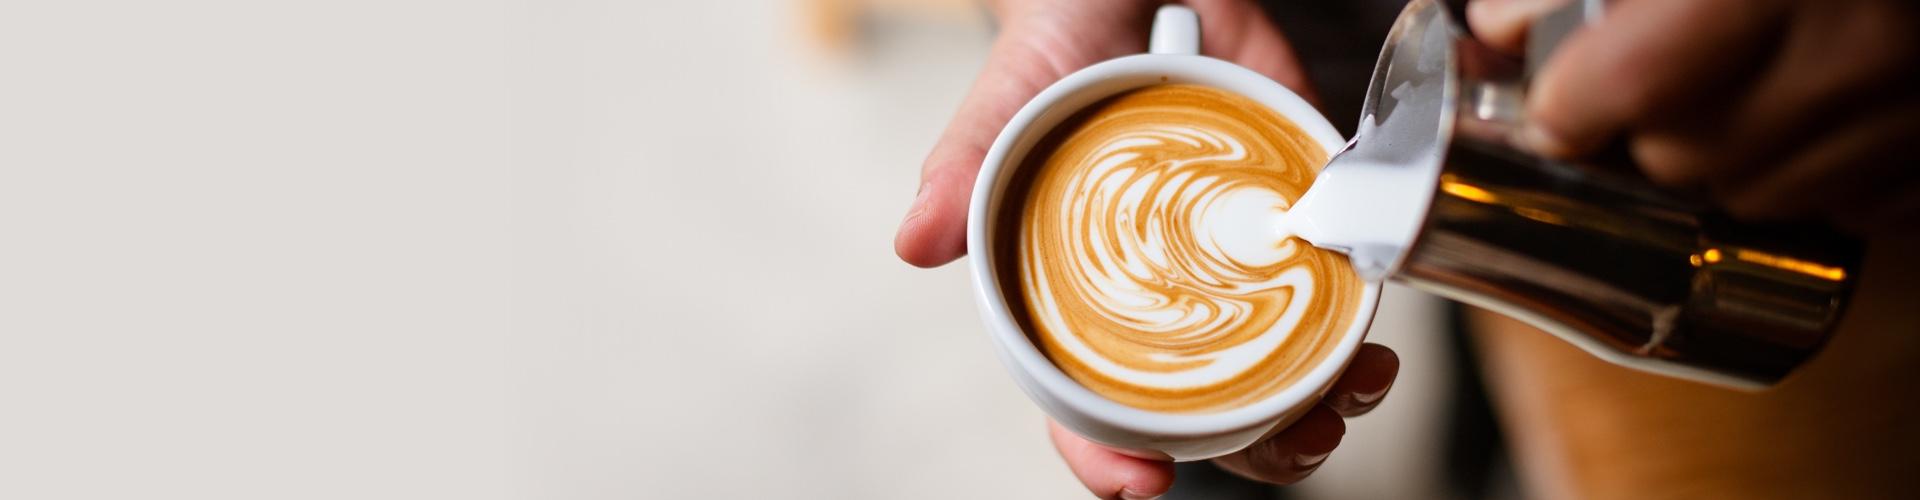 kohvimasina rent